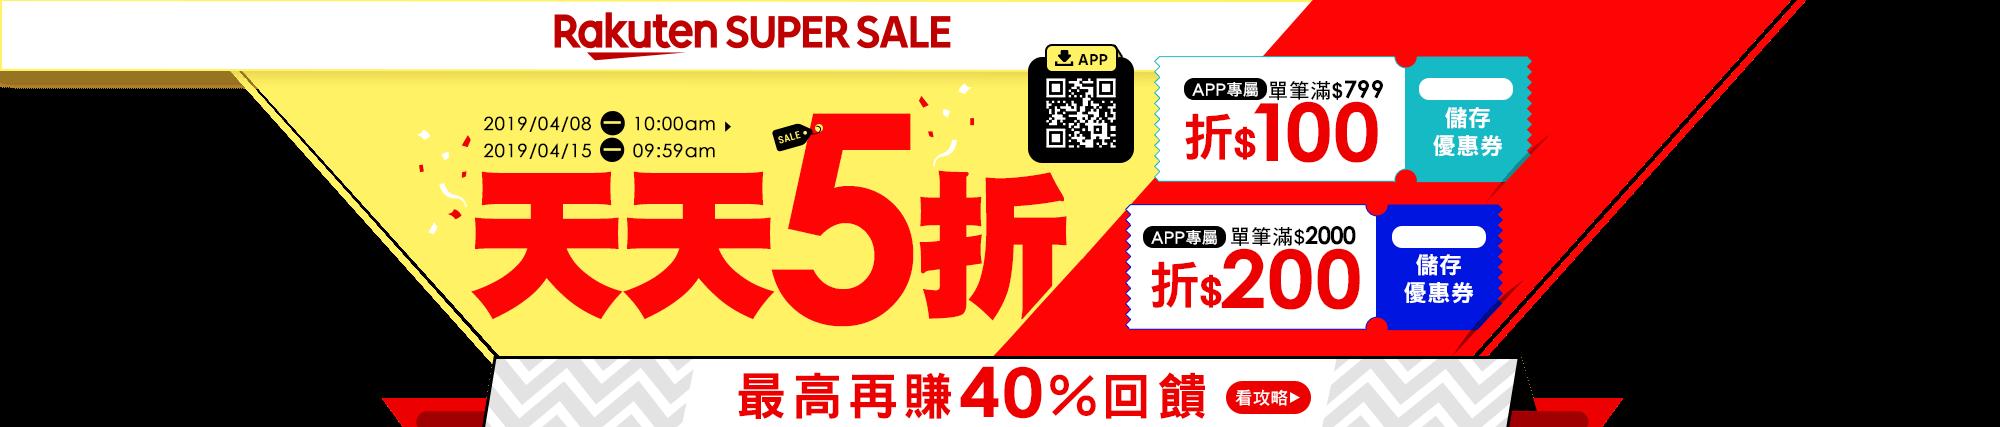 SUPER SALE超級特賣週:整點特賣熱門商品限時5折免運,最高再賺40%點數回饋